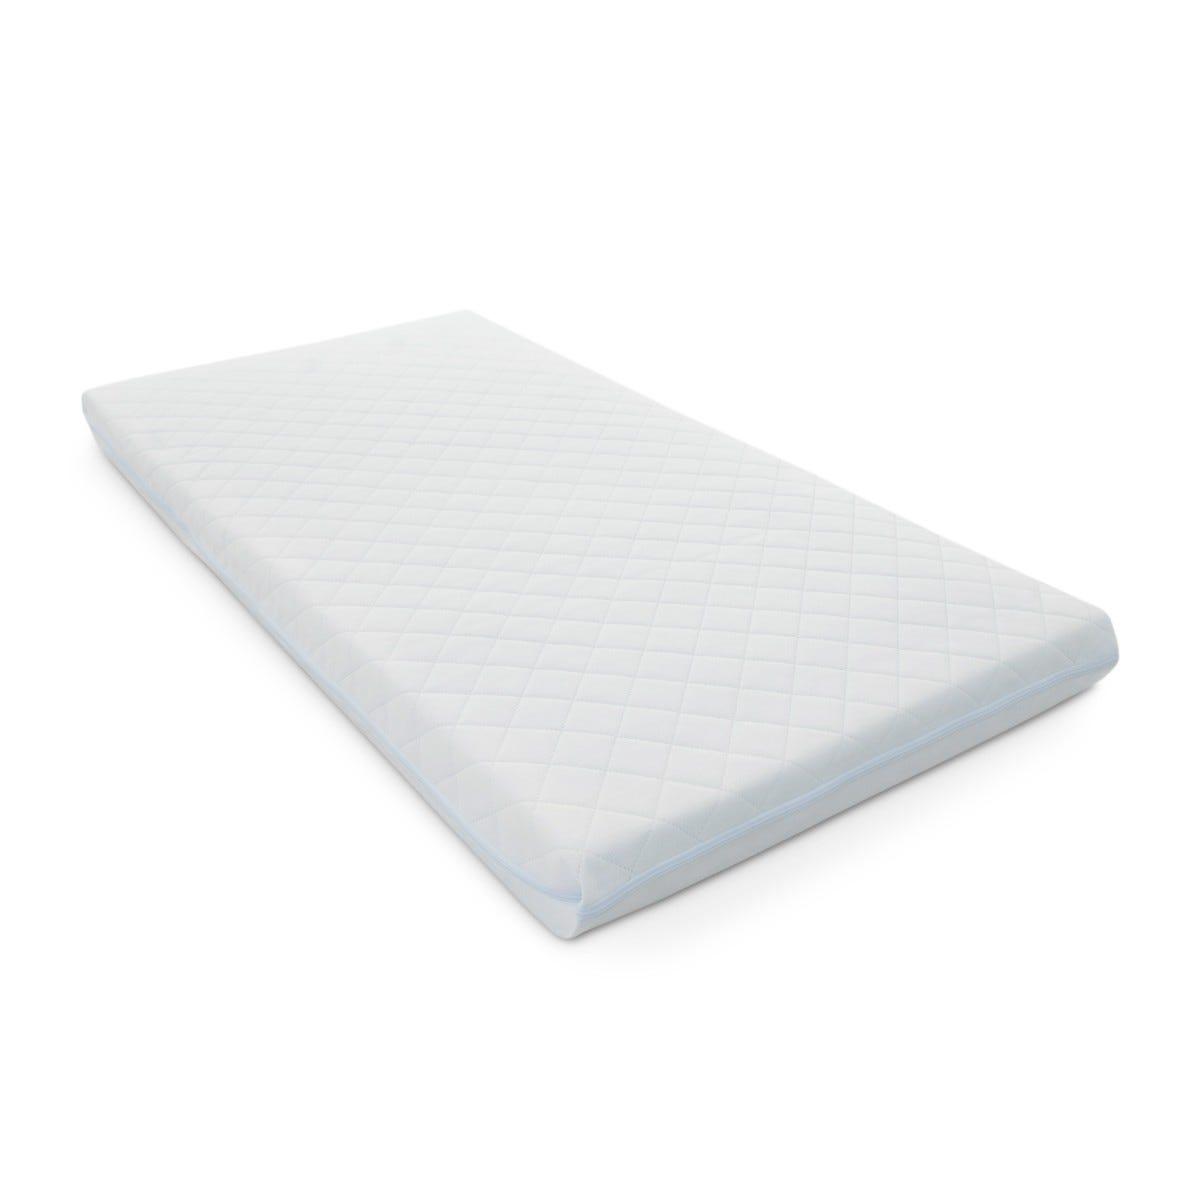 Ickle Bubba Sprung Cot Bed Mattress 140 x 70cm